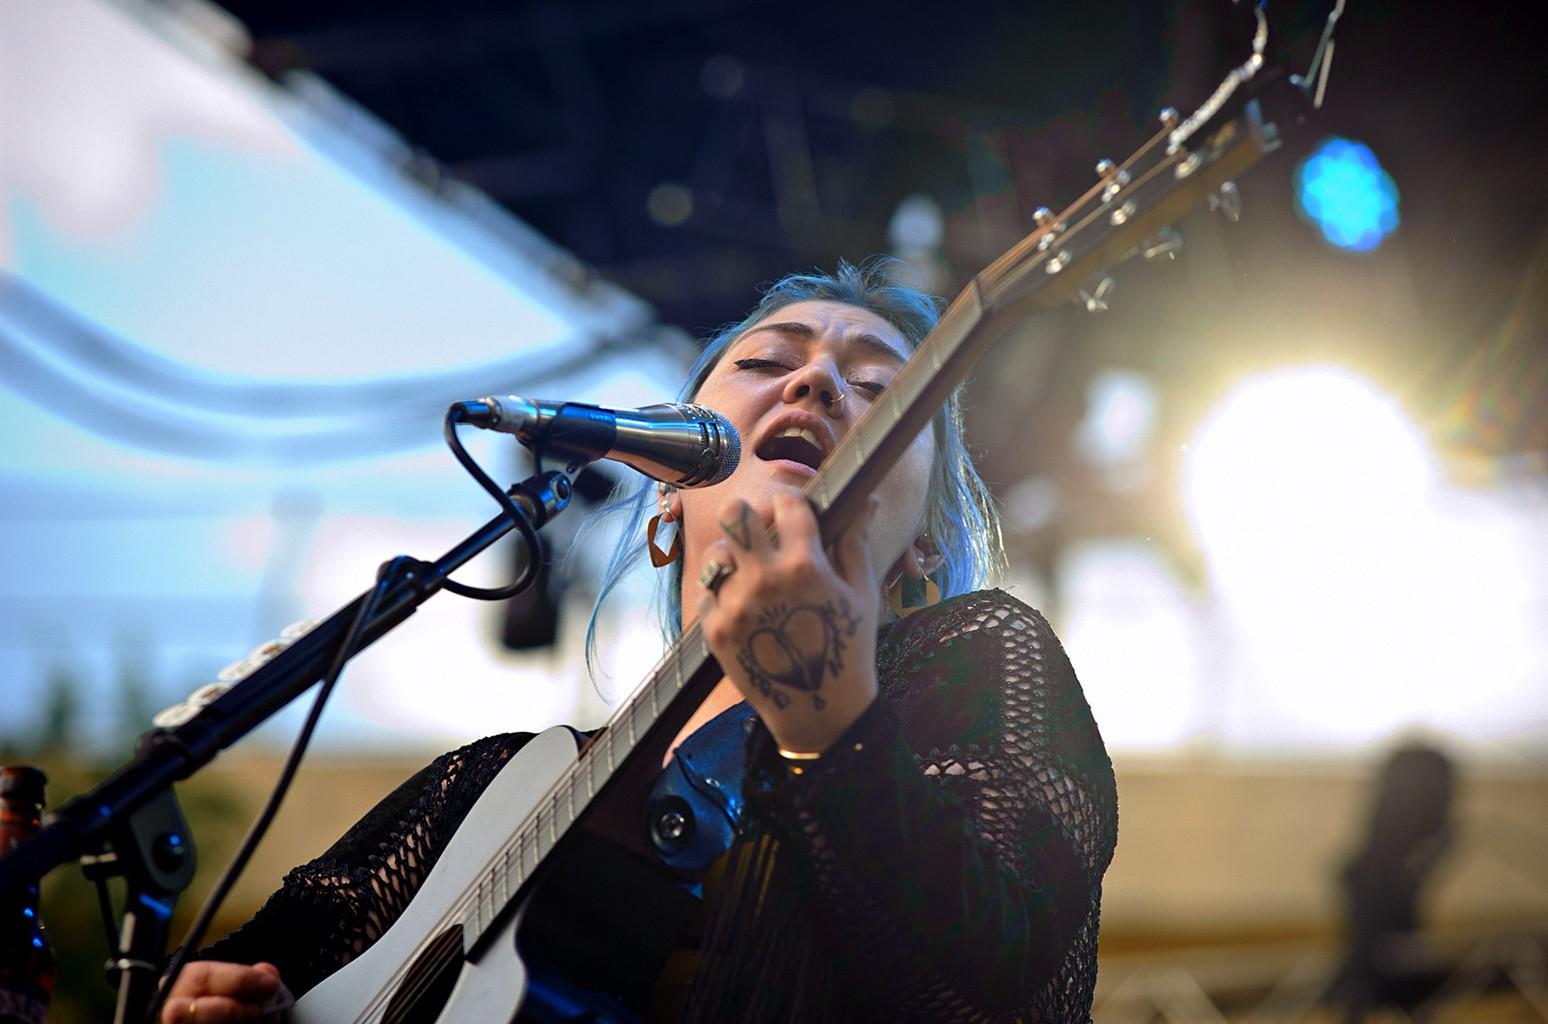 Elle King performs at the 2016 Bunbury festival